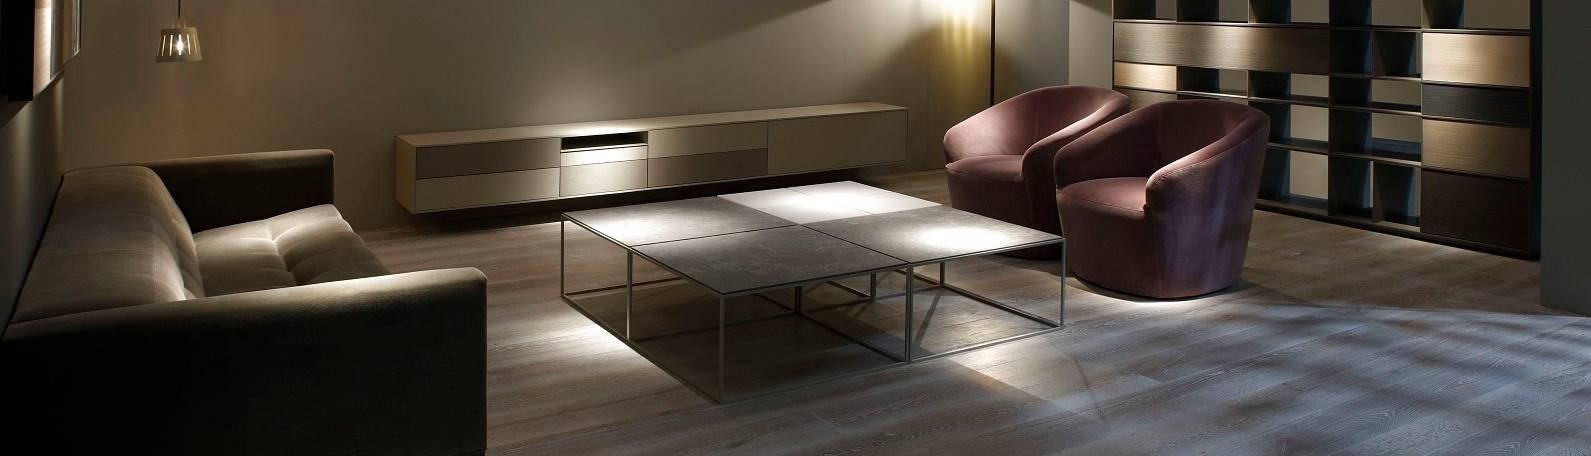 Catalogue Gala Furniture World